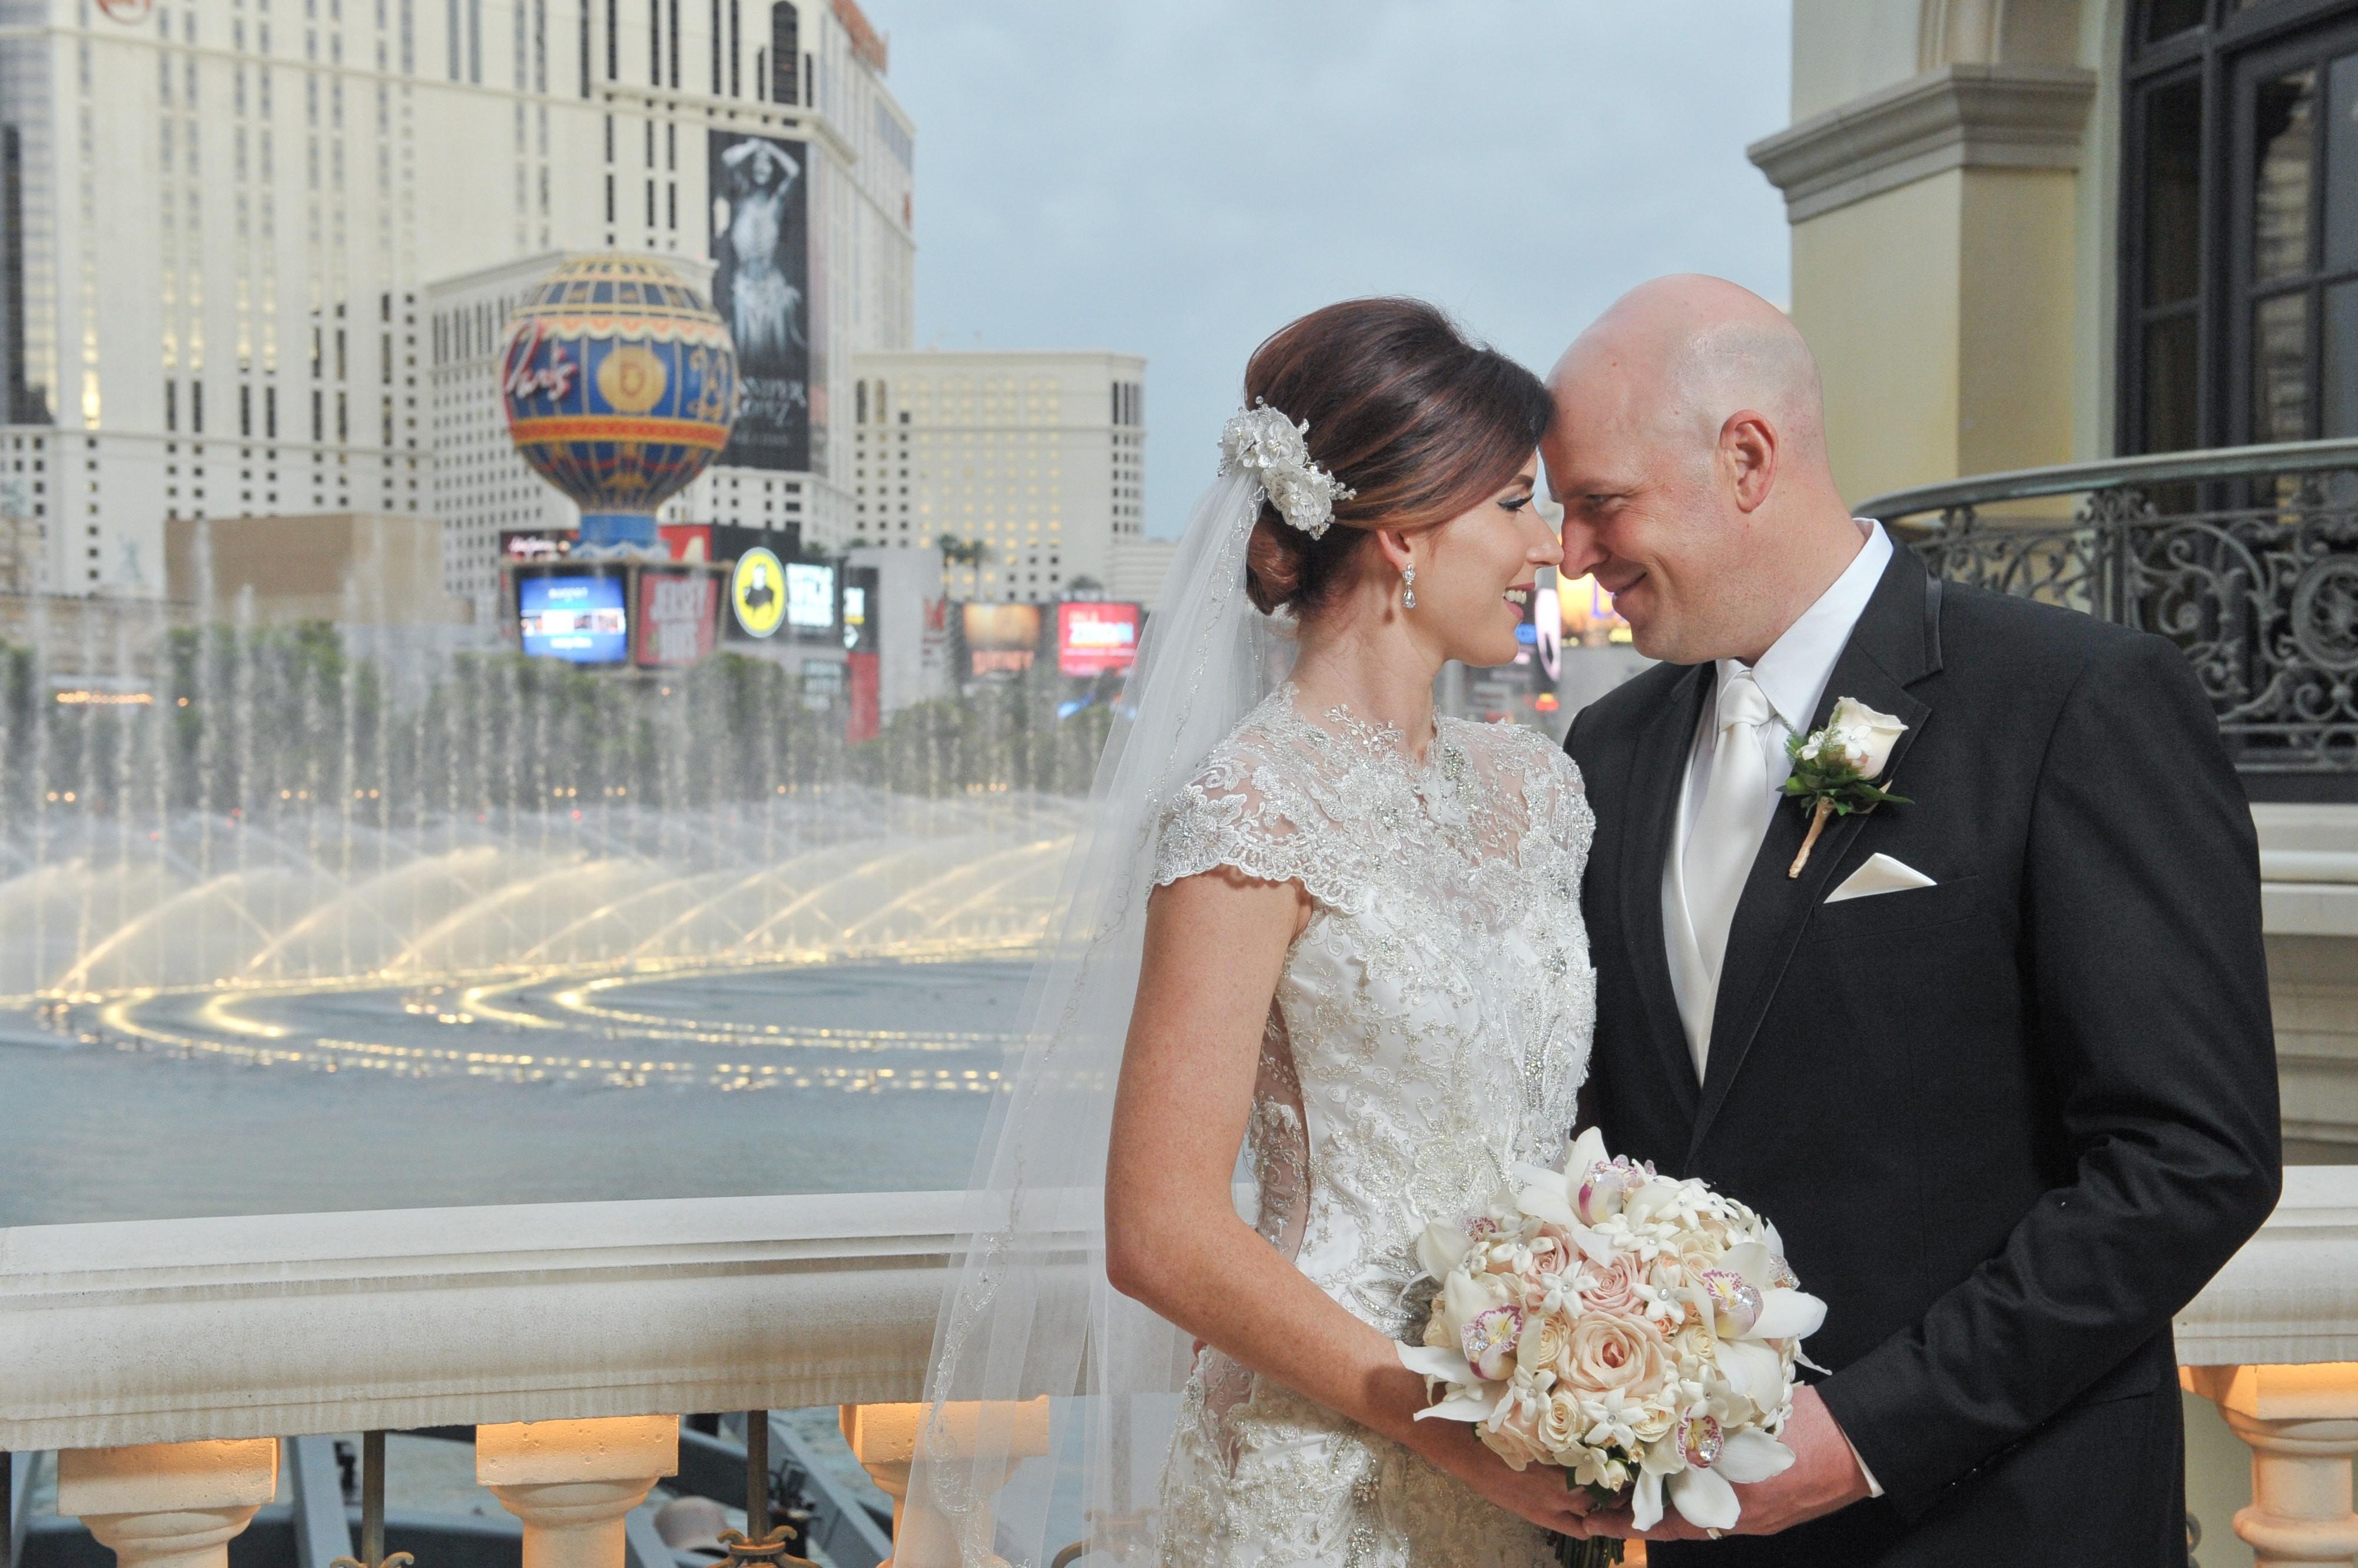 Wedding In Vegas.The Best Destination Wedding Venues In Las Vegas